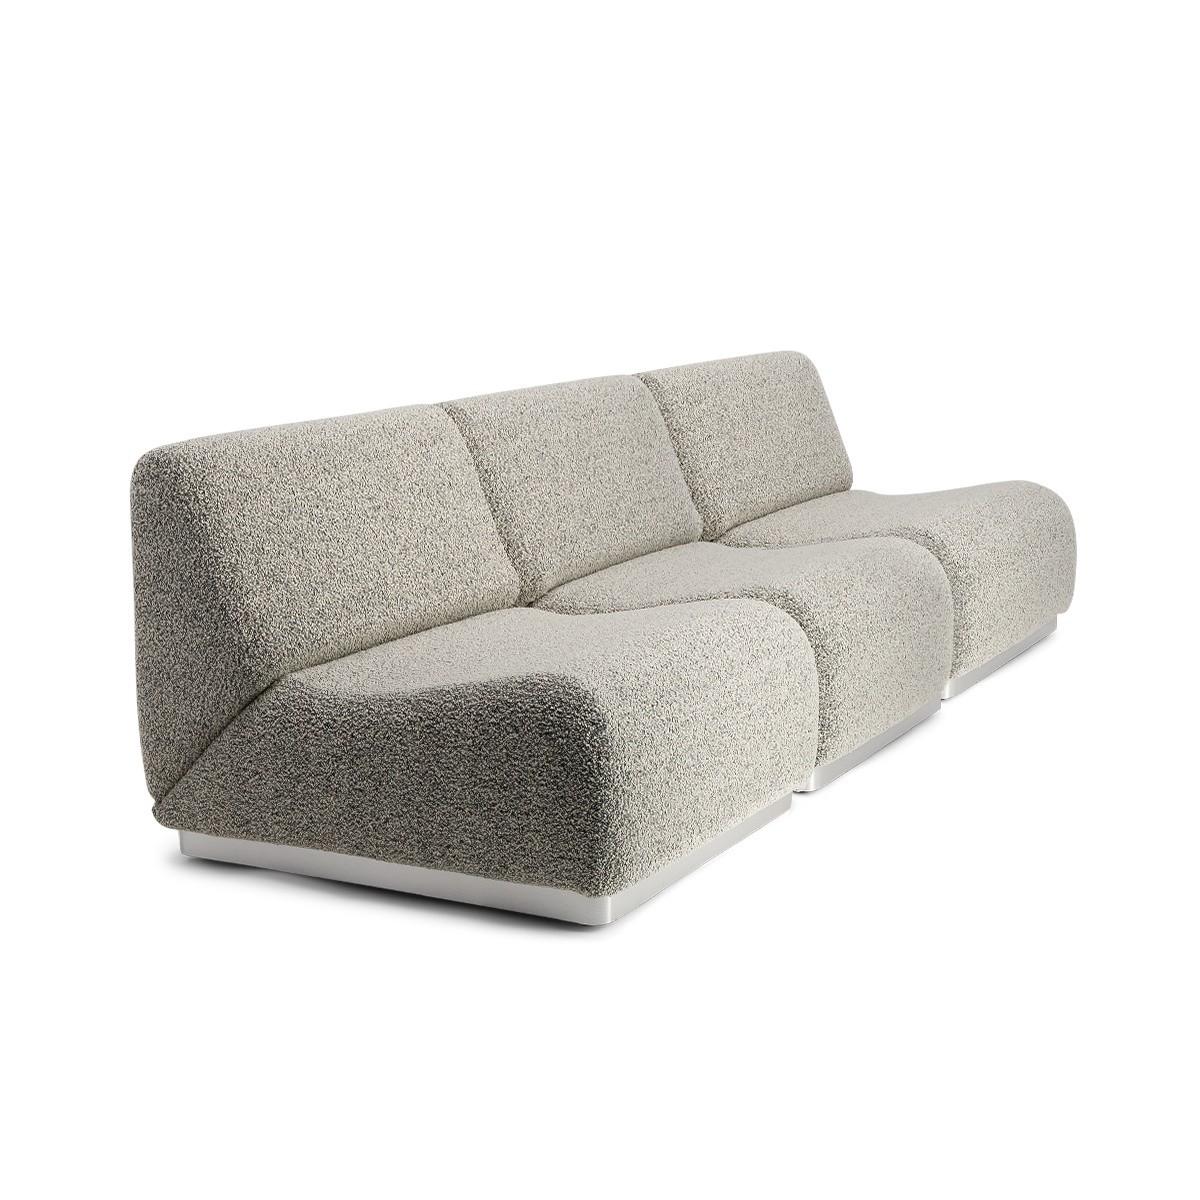 Rotondo Modular Sofa in Black and White Curly Wool